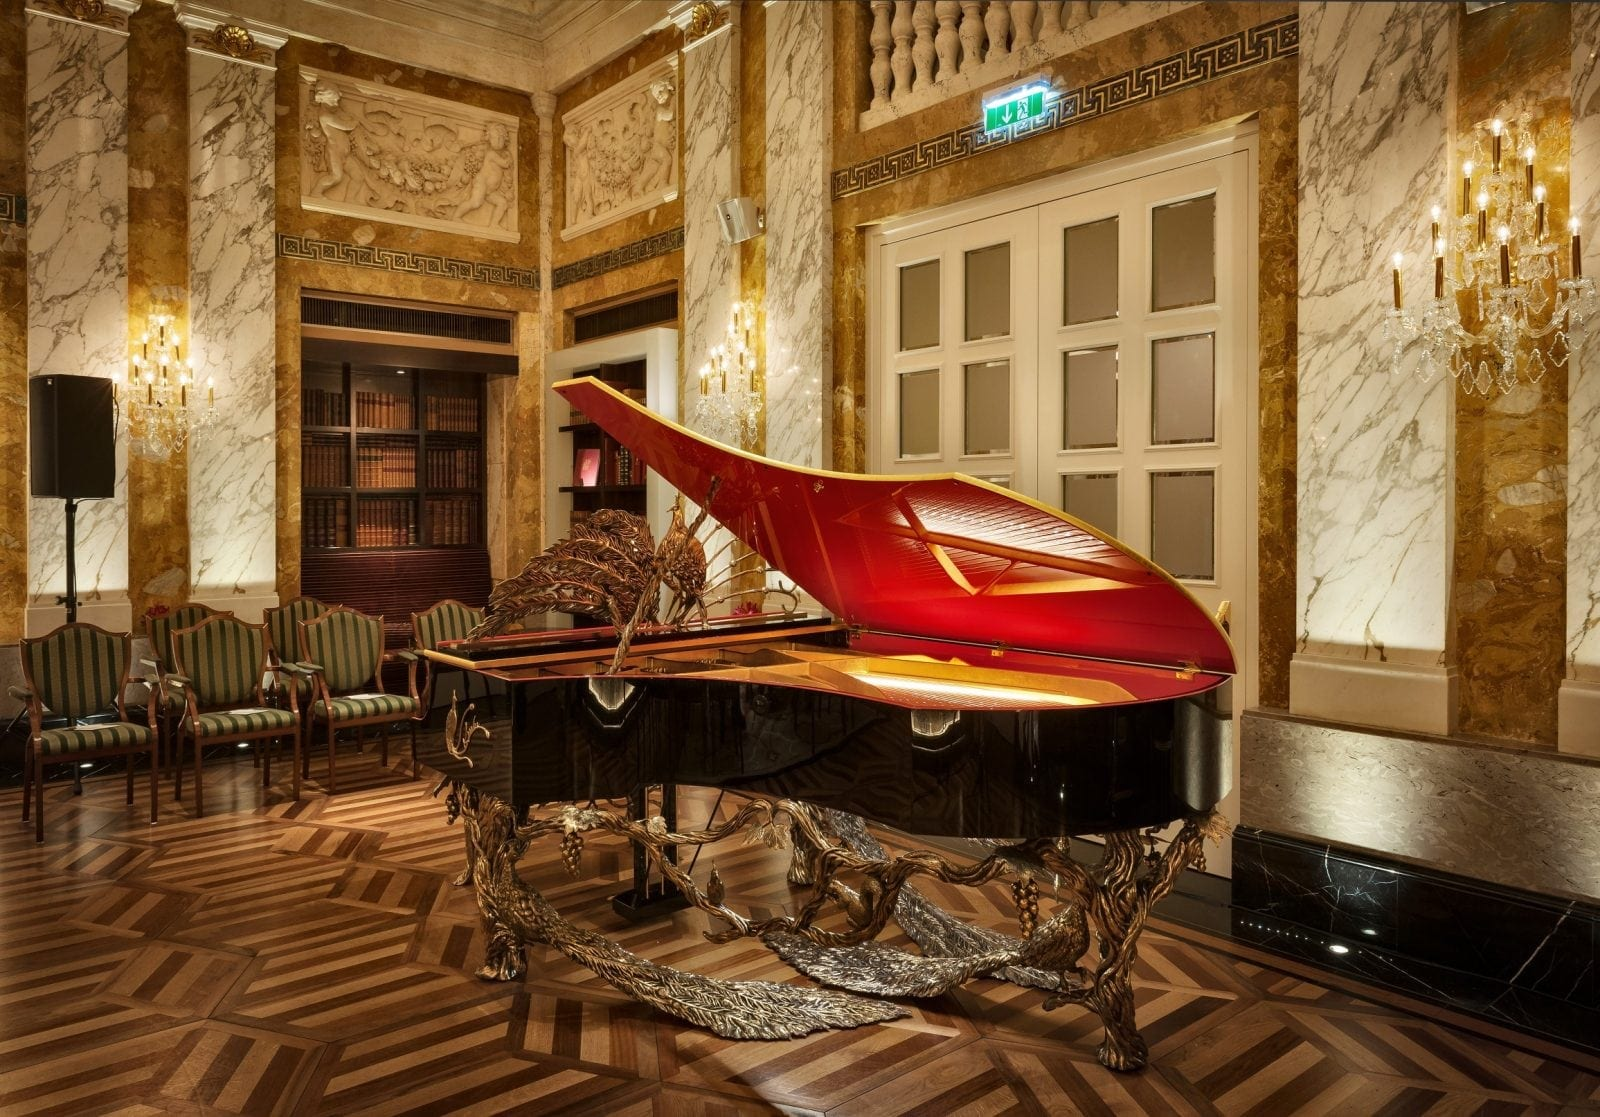 Kessler Hotel Imperial 006 medium - Pianul în ediție limitată Grand Bohemian by Bösendorfer